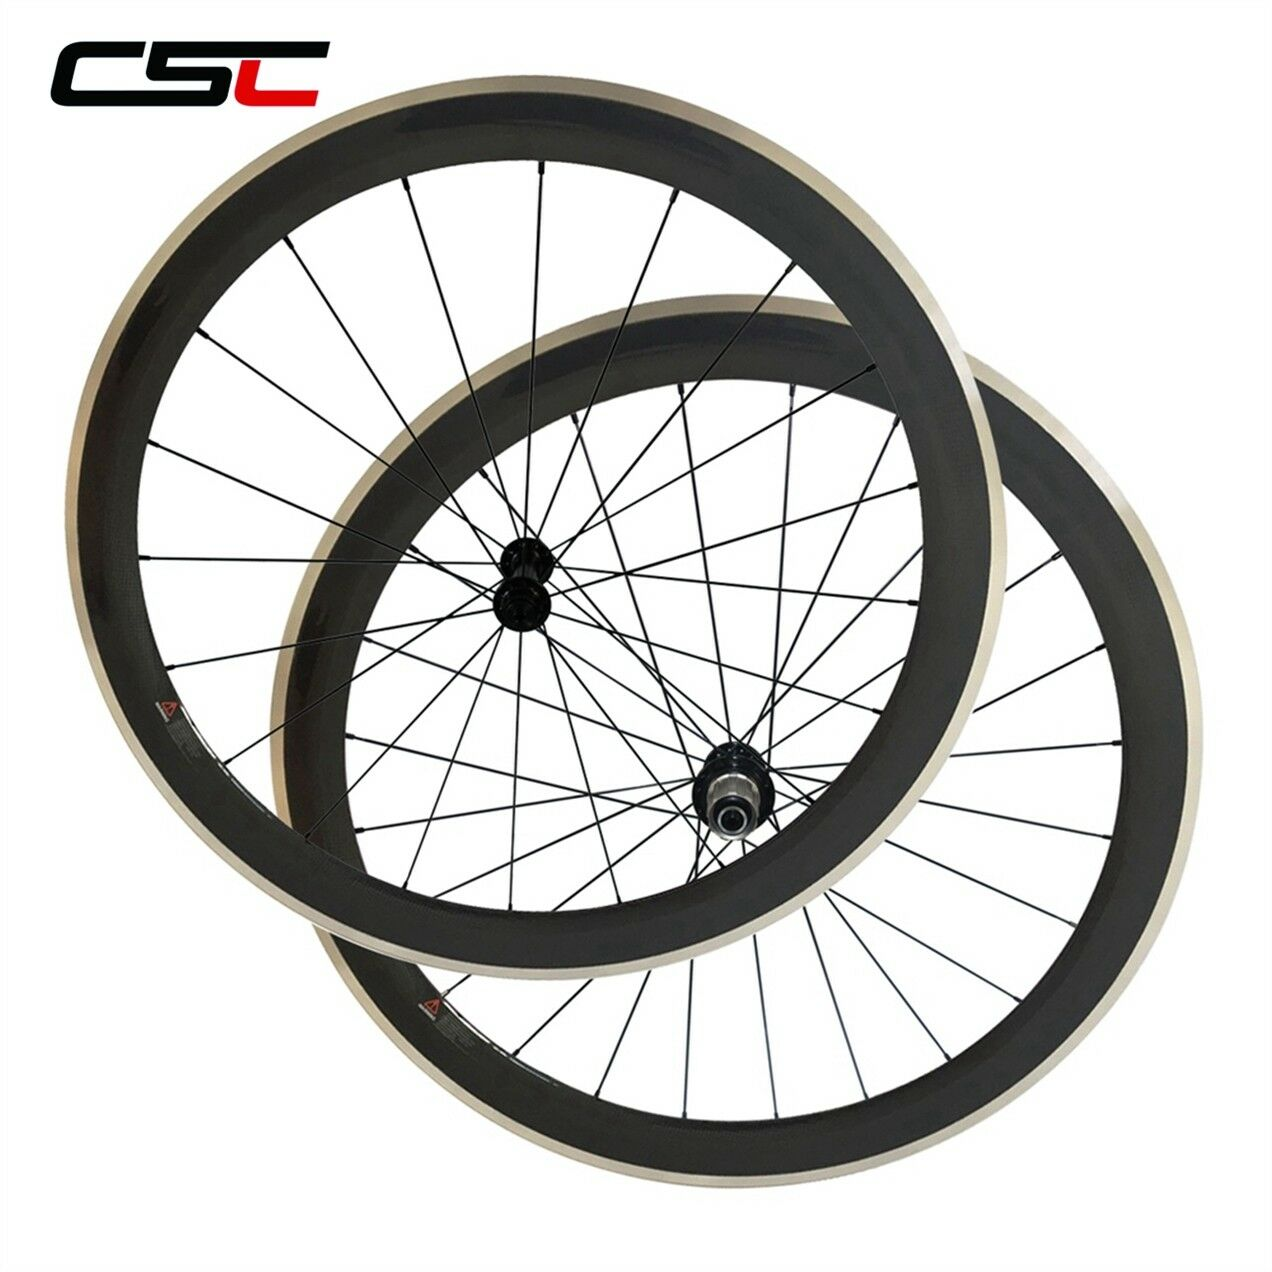 Aluminium Brake Surface 38mm  50mm 60mm 80mm Clincher Carbon Bike Wheels  cheap store